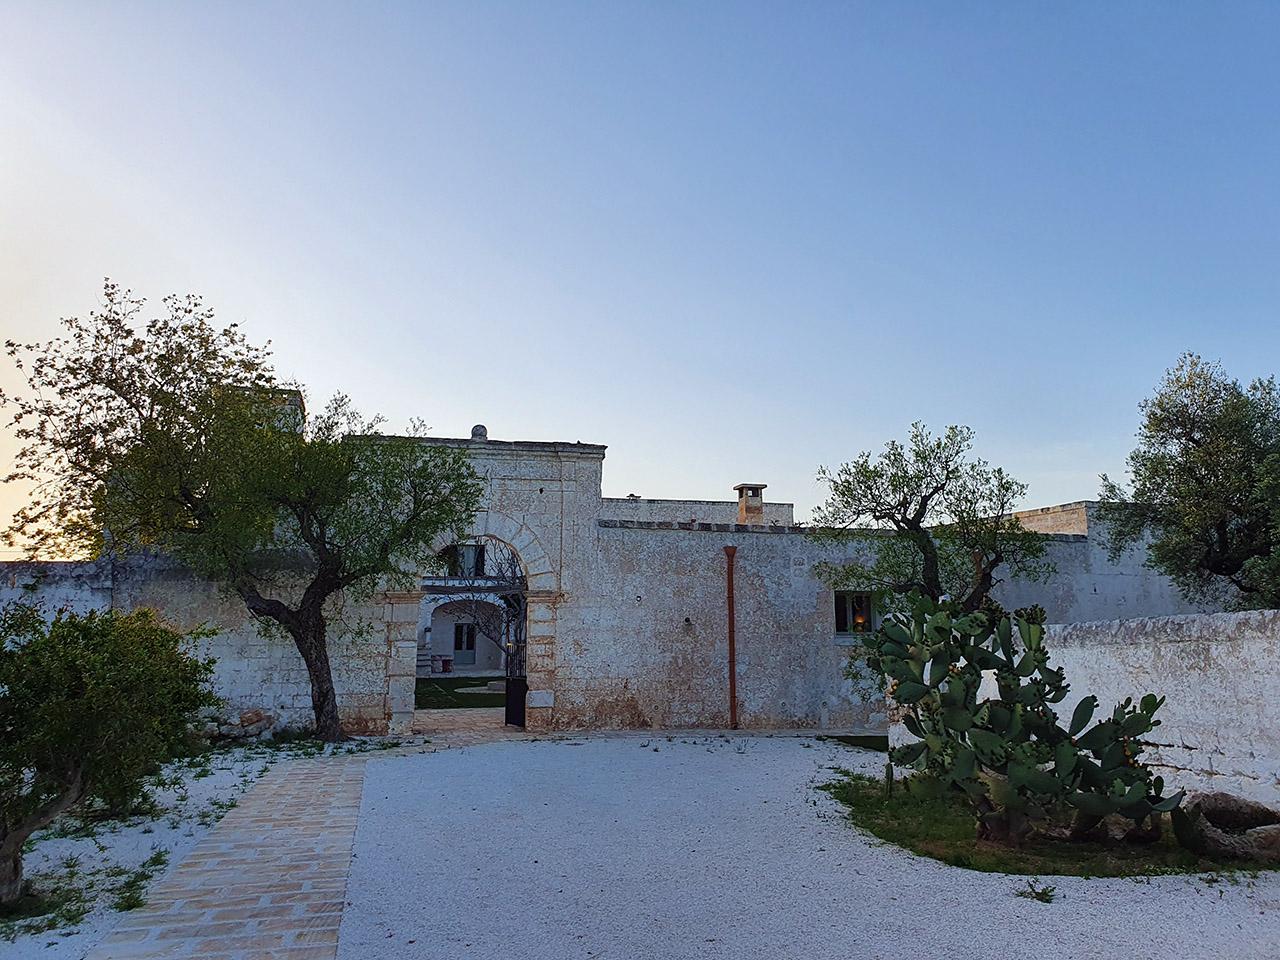 costruzioni restauri sirio ostuni restauro ristrutturazione masseria mangiamuso ostuni 20200509 191323